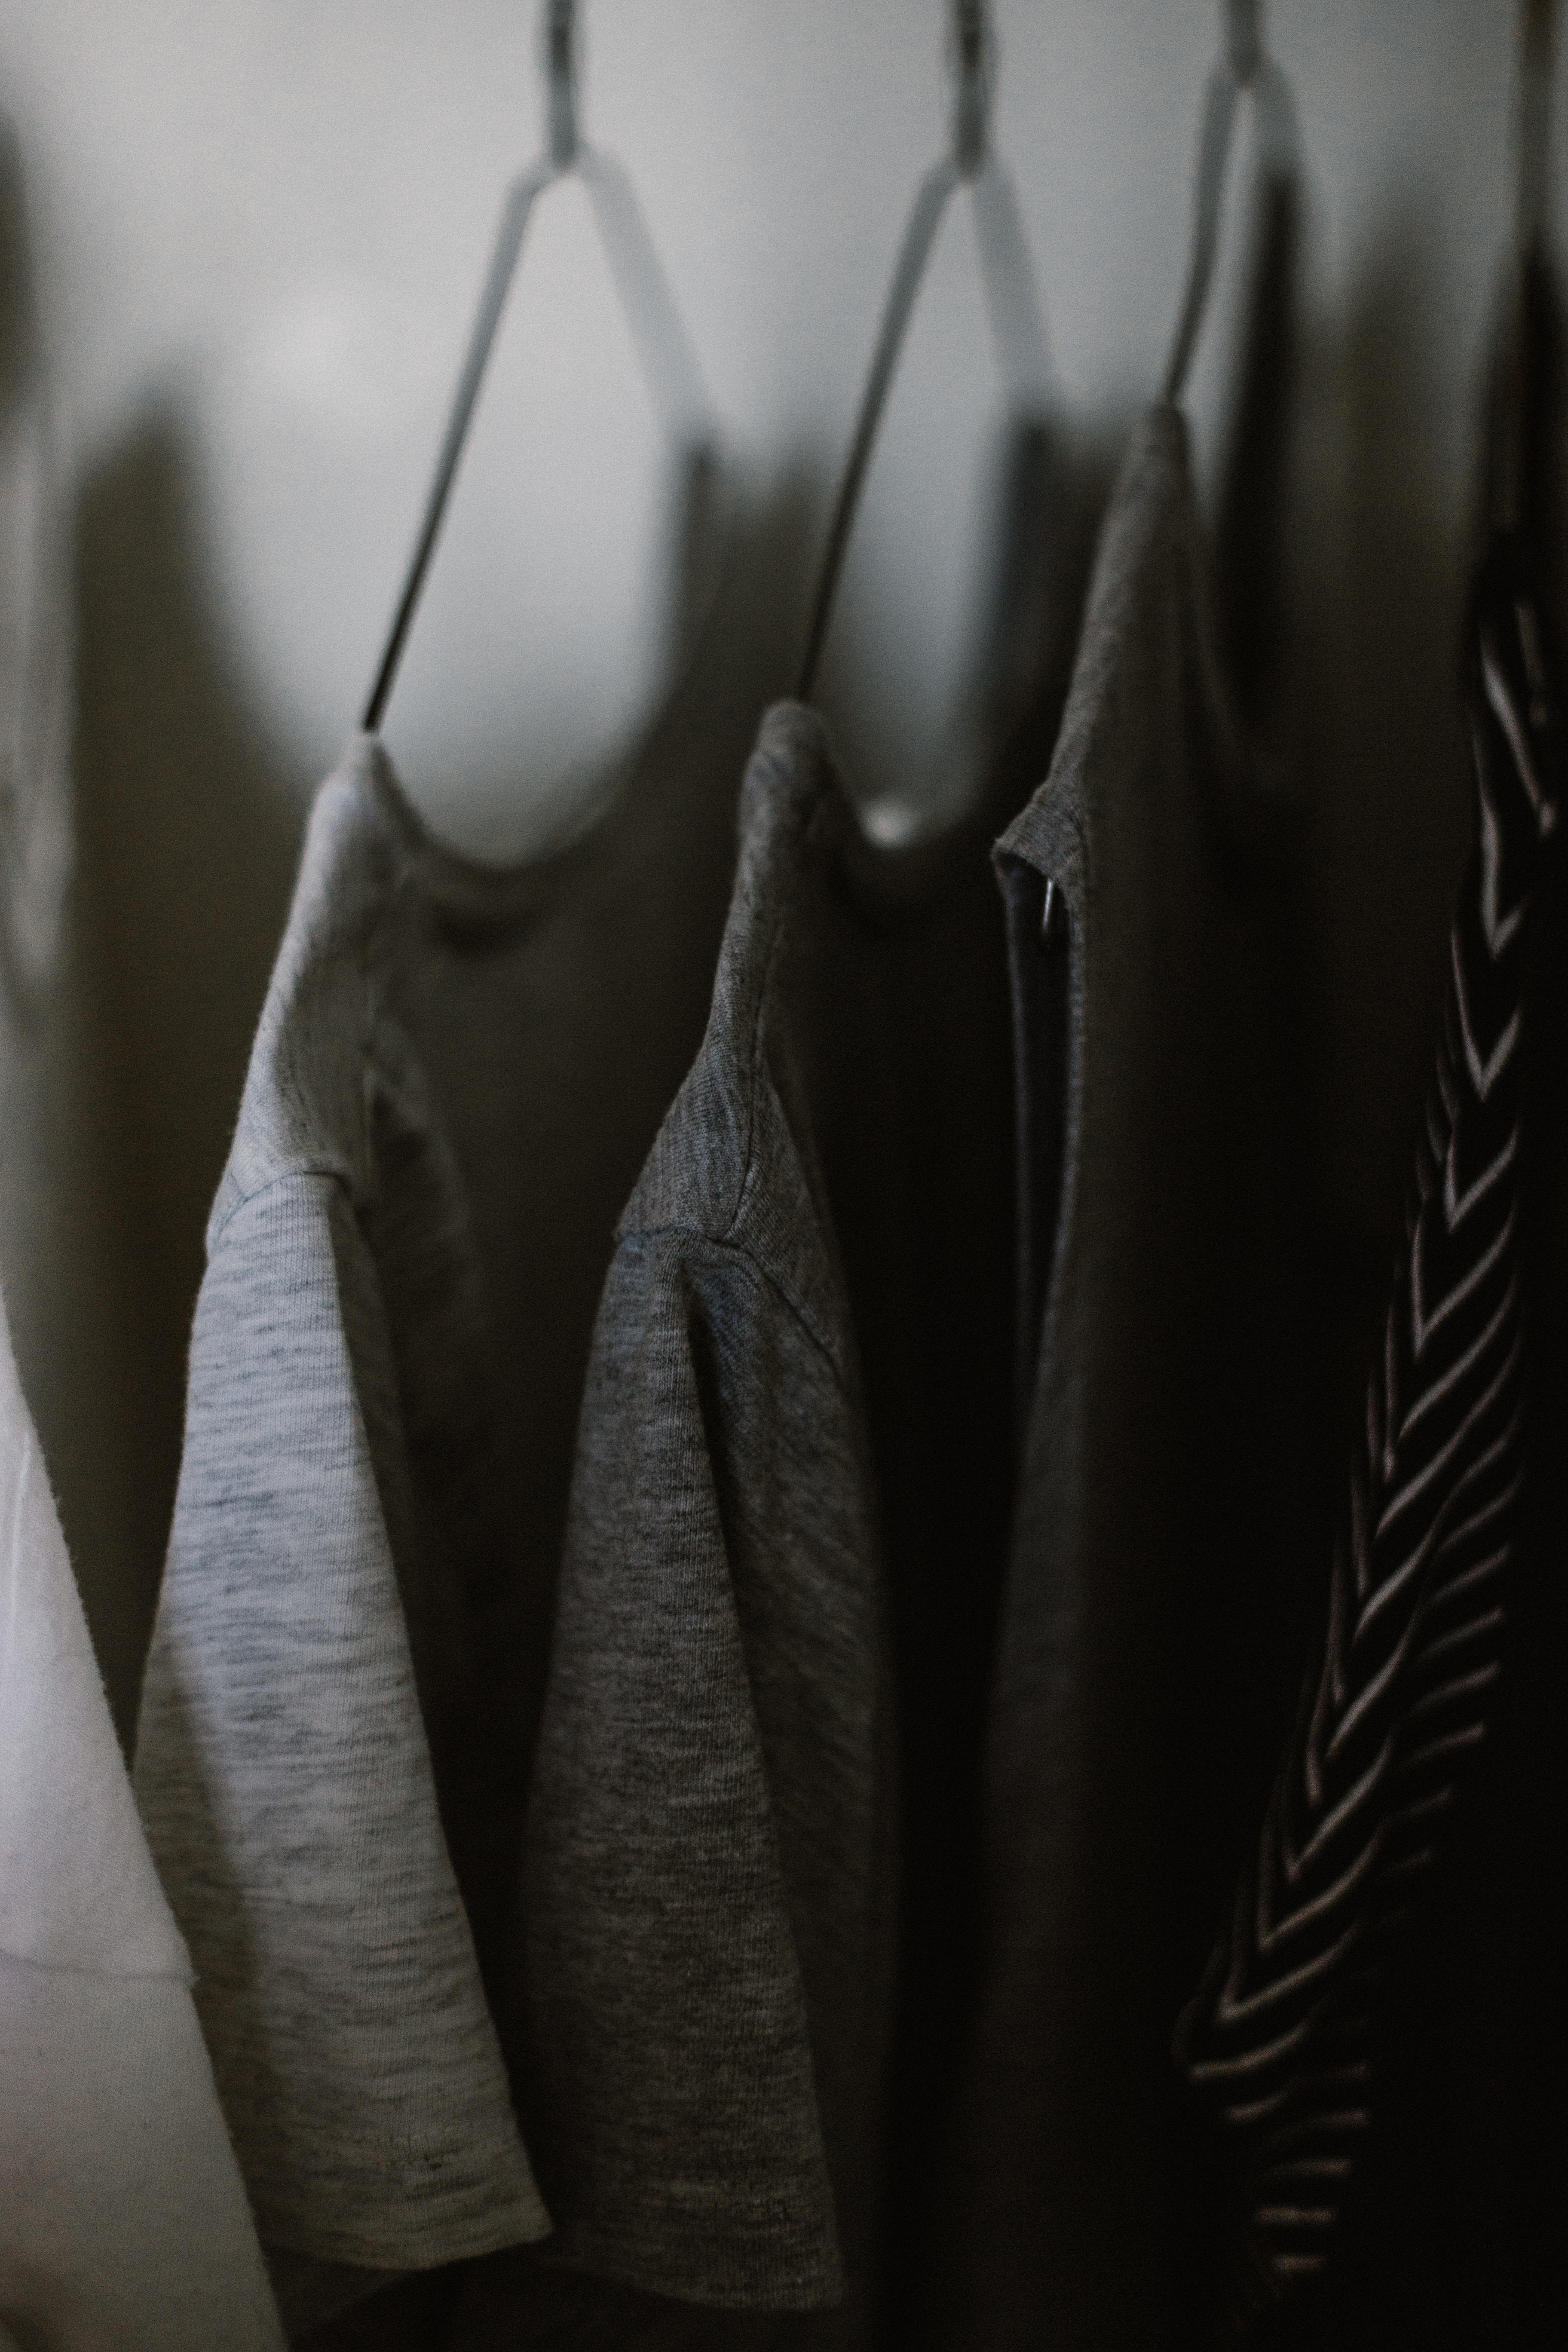 selective focus photography of hanged three gray tee shirts